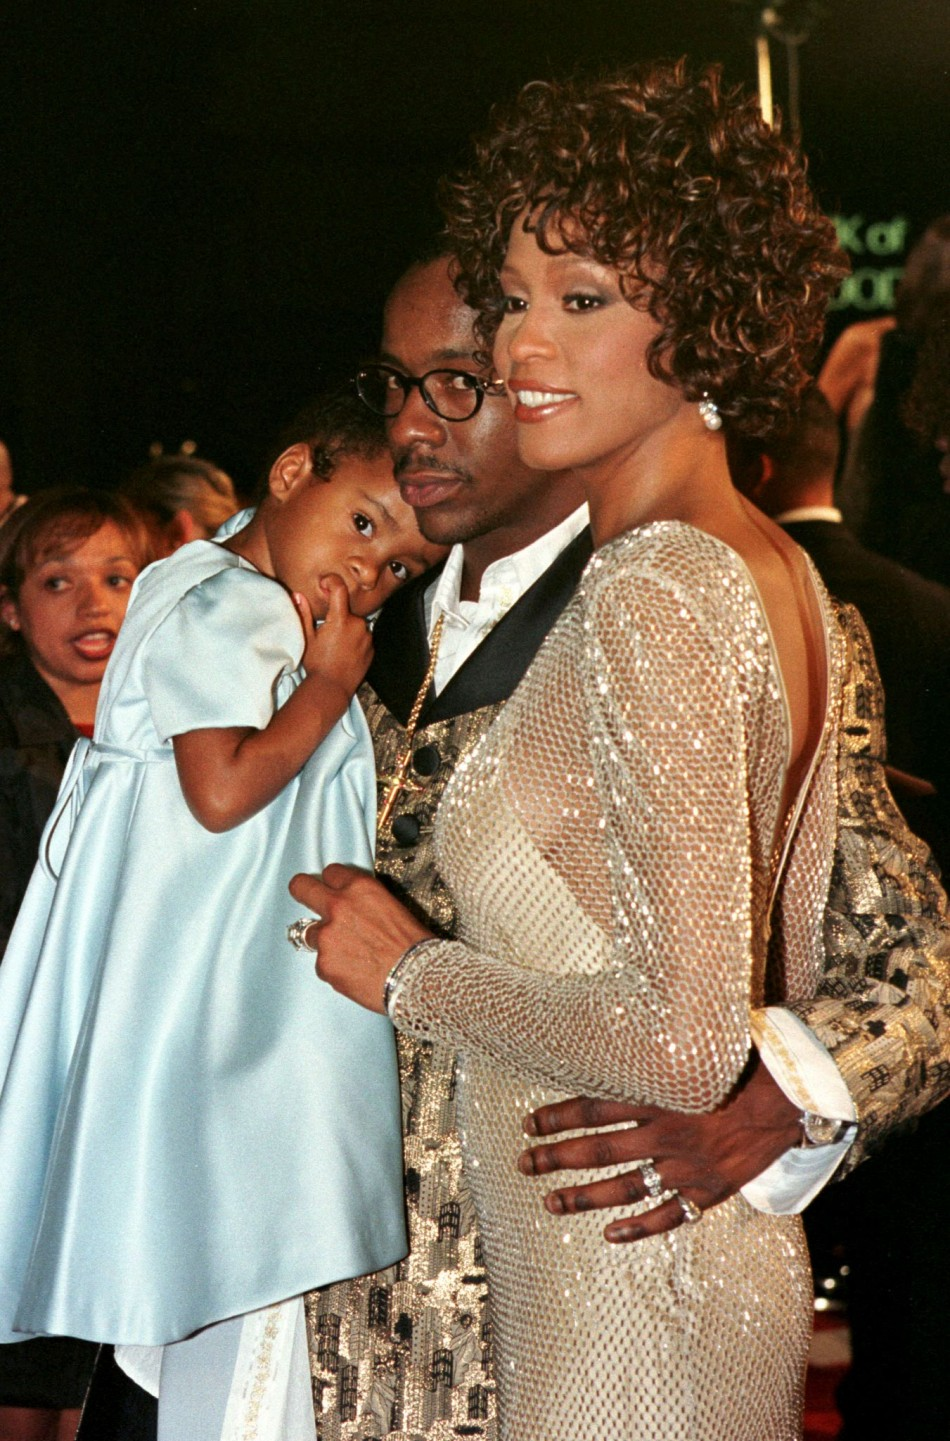 Bobbi Kristina Hospitalized - Whitney Houston s Daughter Photos of whitney houston and bobbi kristina